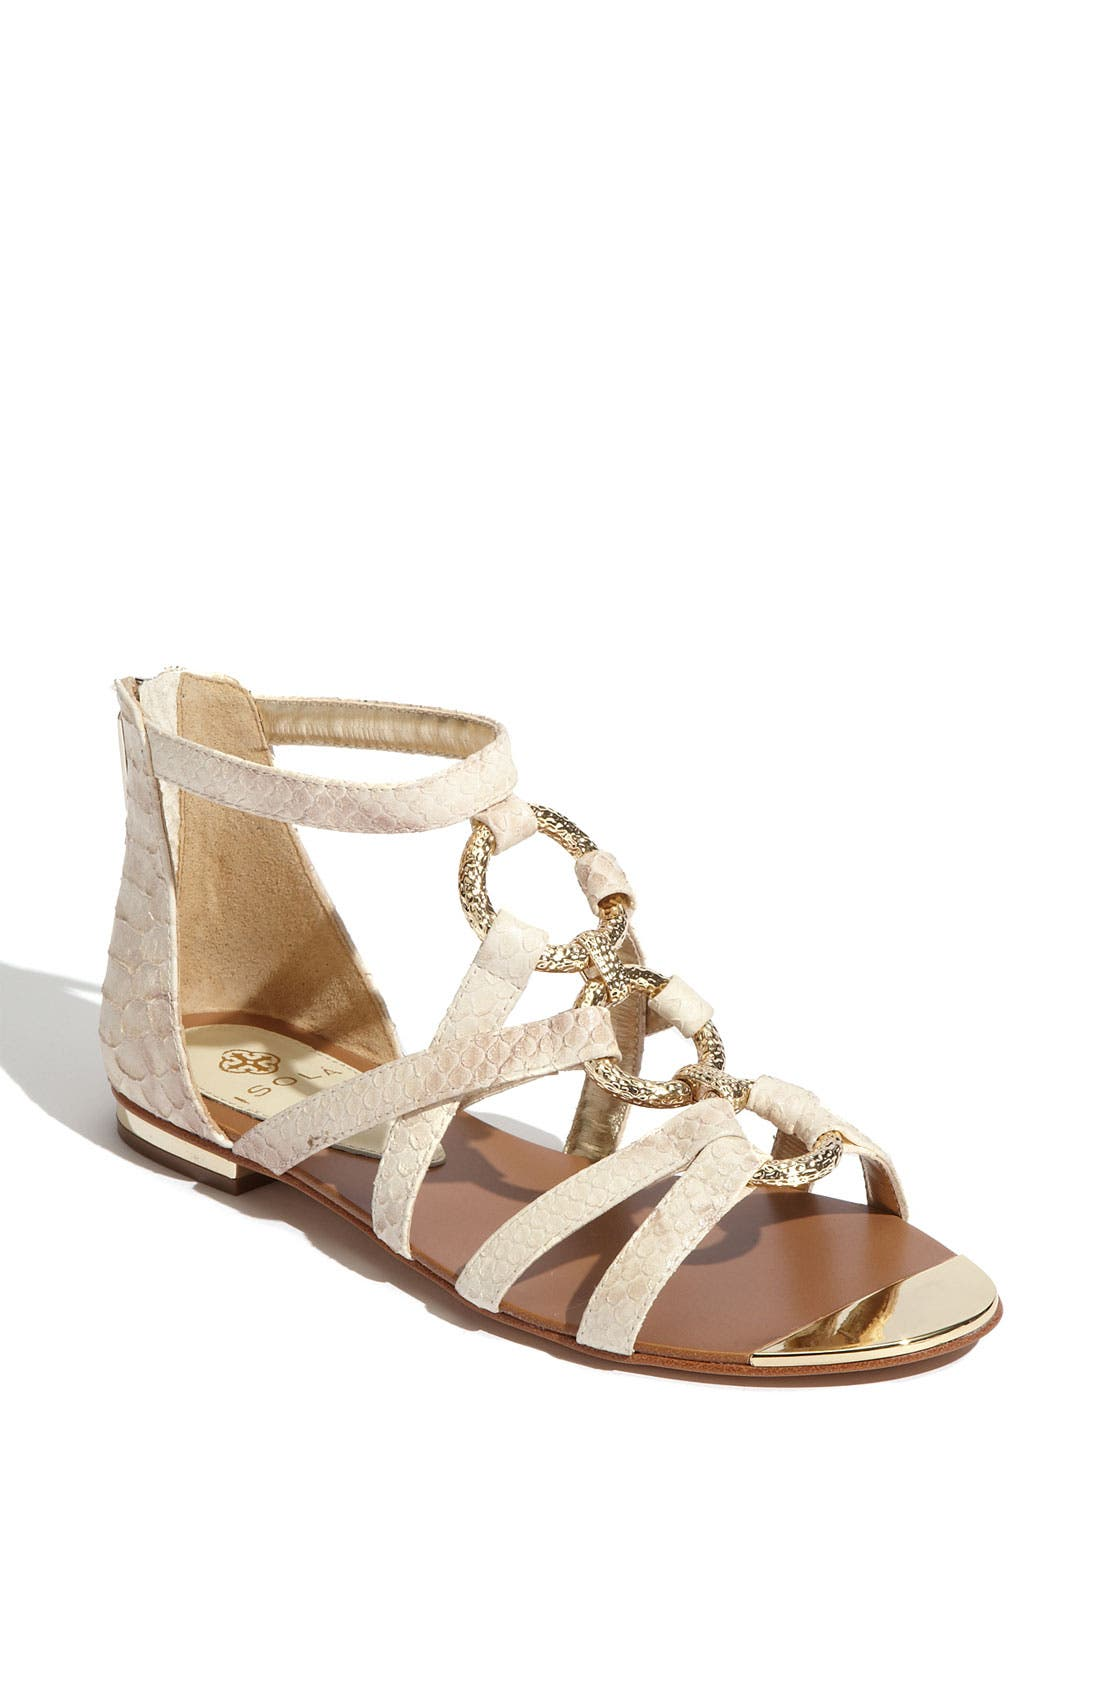 Main Image - Isolá 'Adriel' Flat Sandal